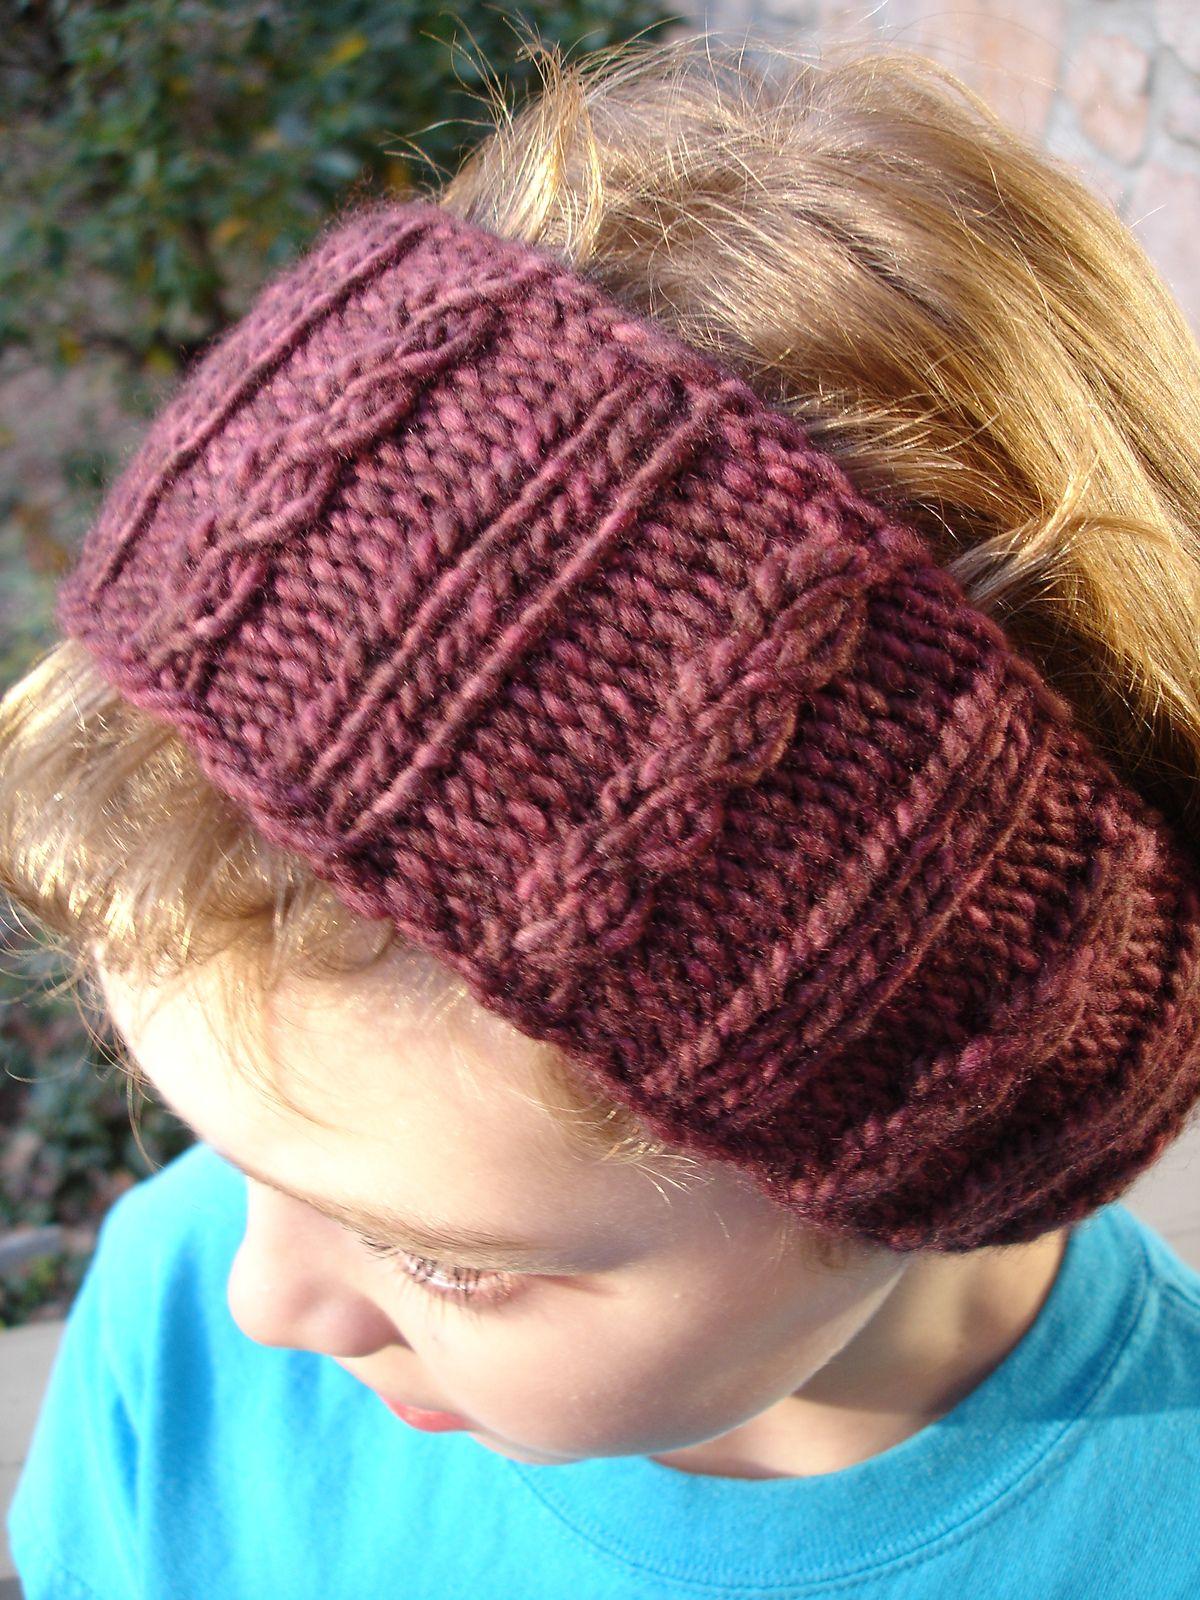 Earwarmer Knitting Patterns Free One Skein Knitting Patterns Knitting Pinterest Knitting